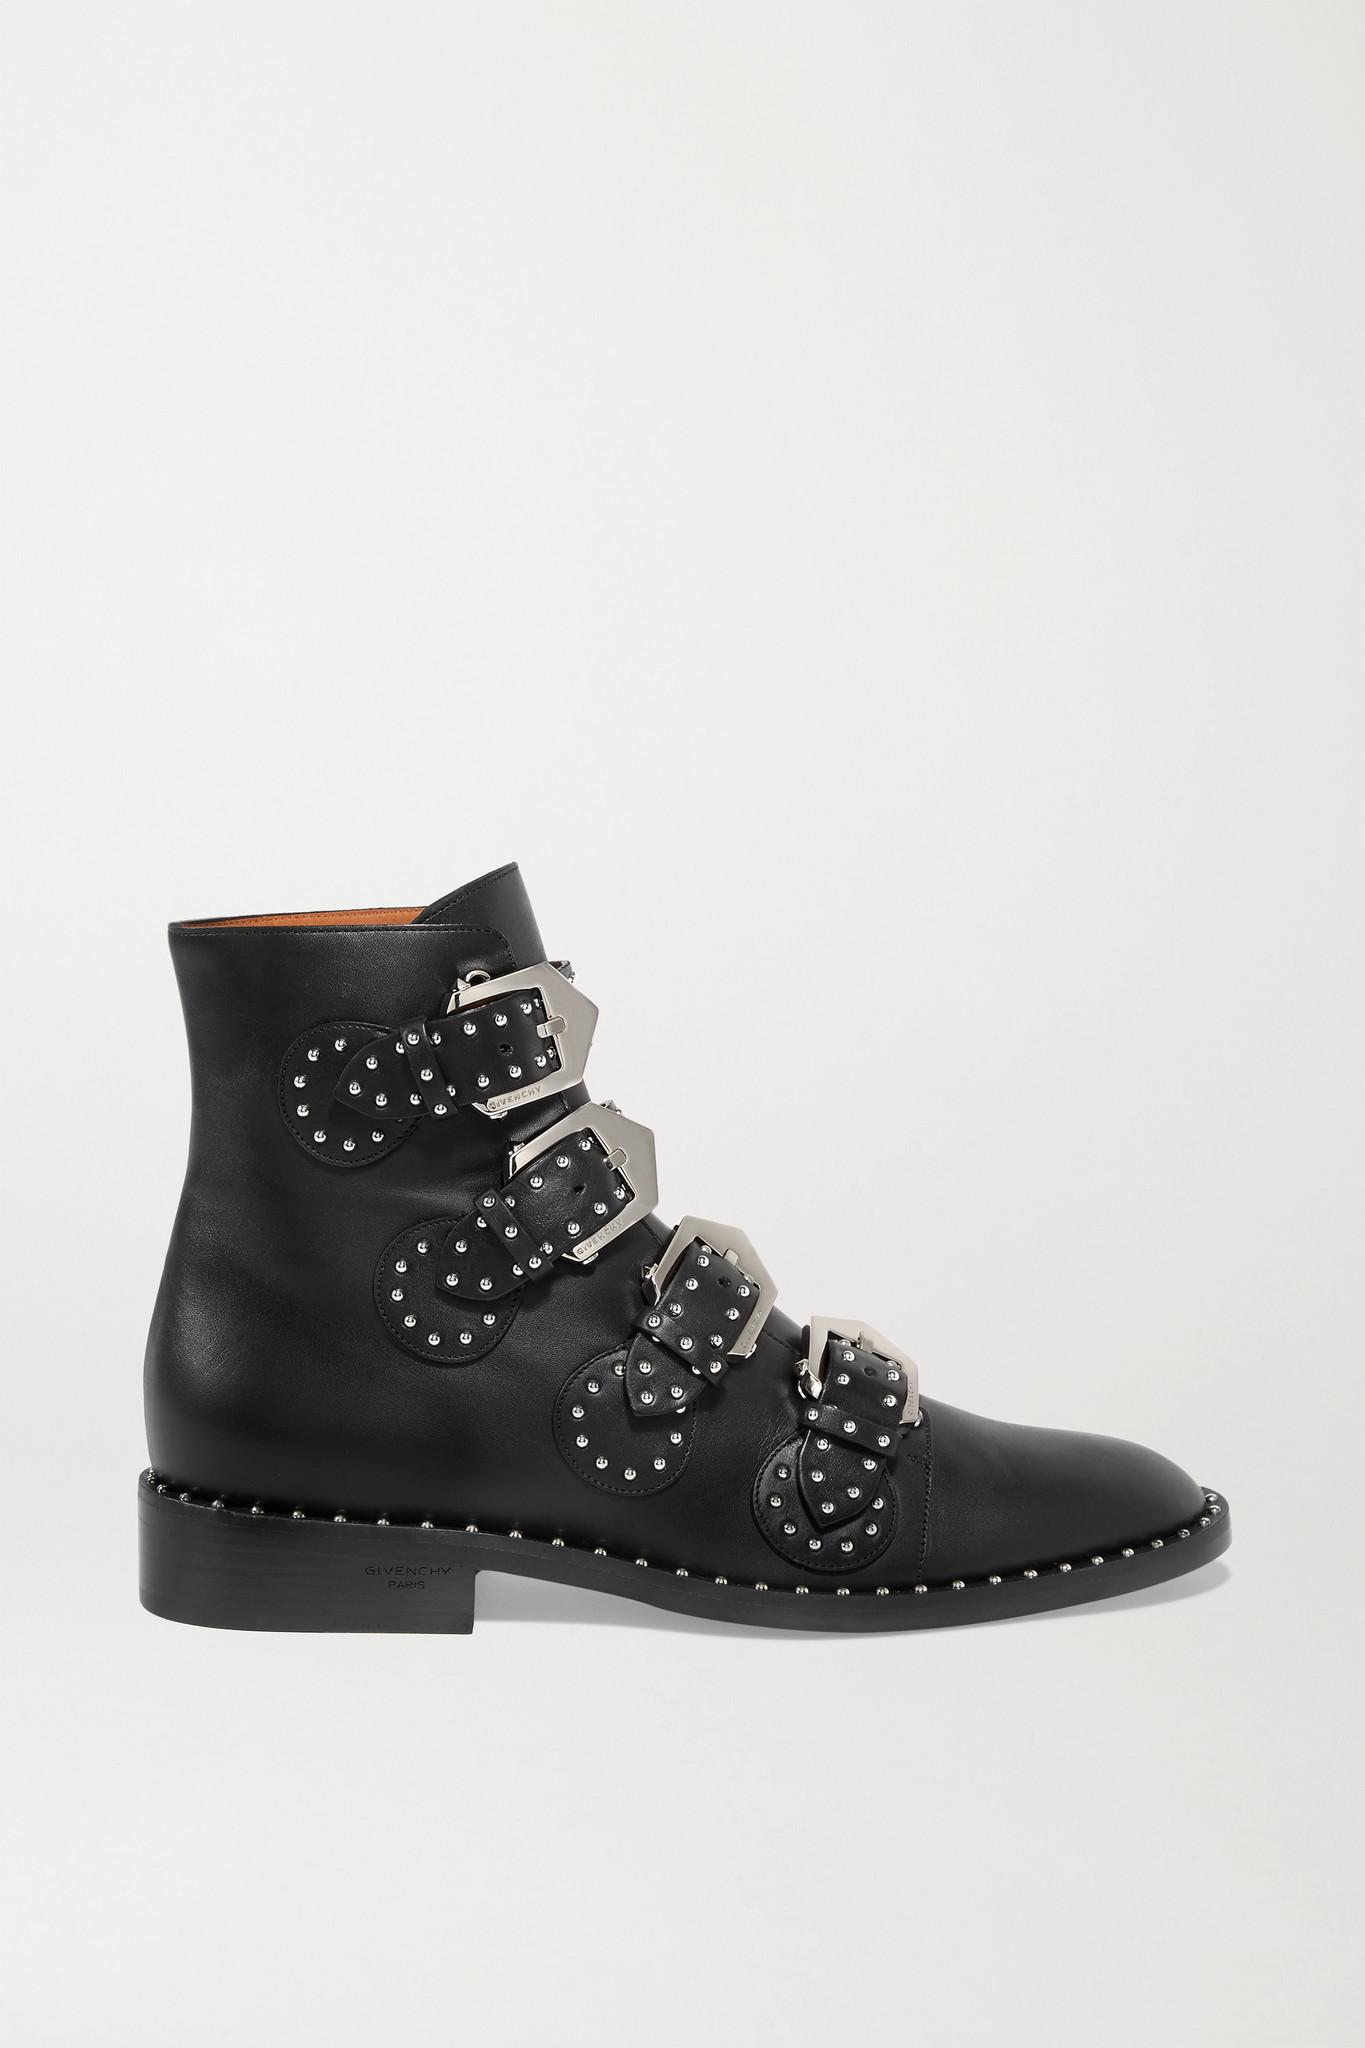 GIVENCHY - Elegant 铆钉皮革踝靴 - 黑色 - IT35.5